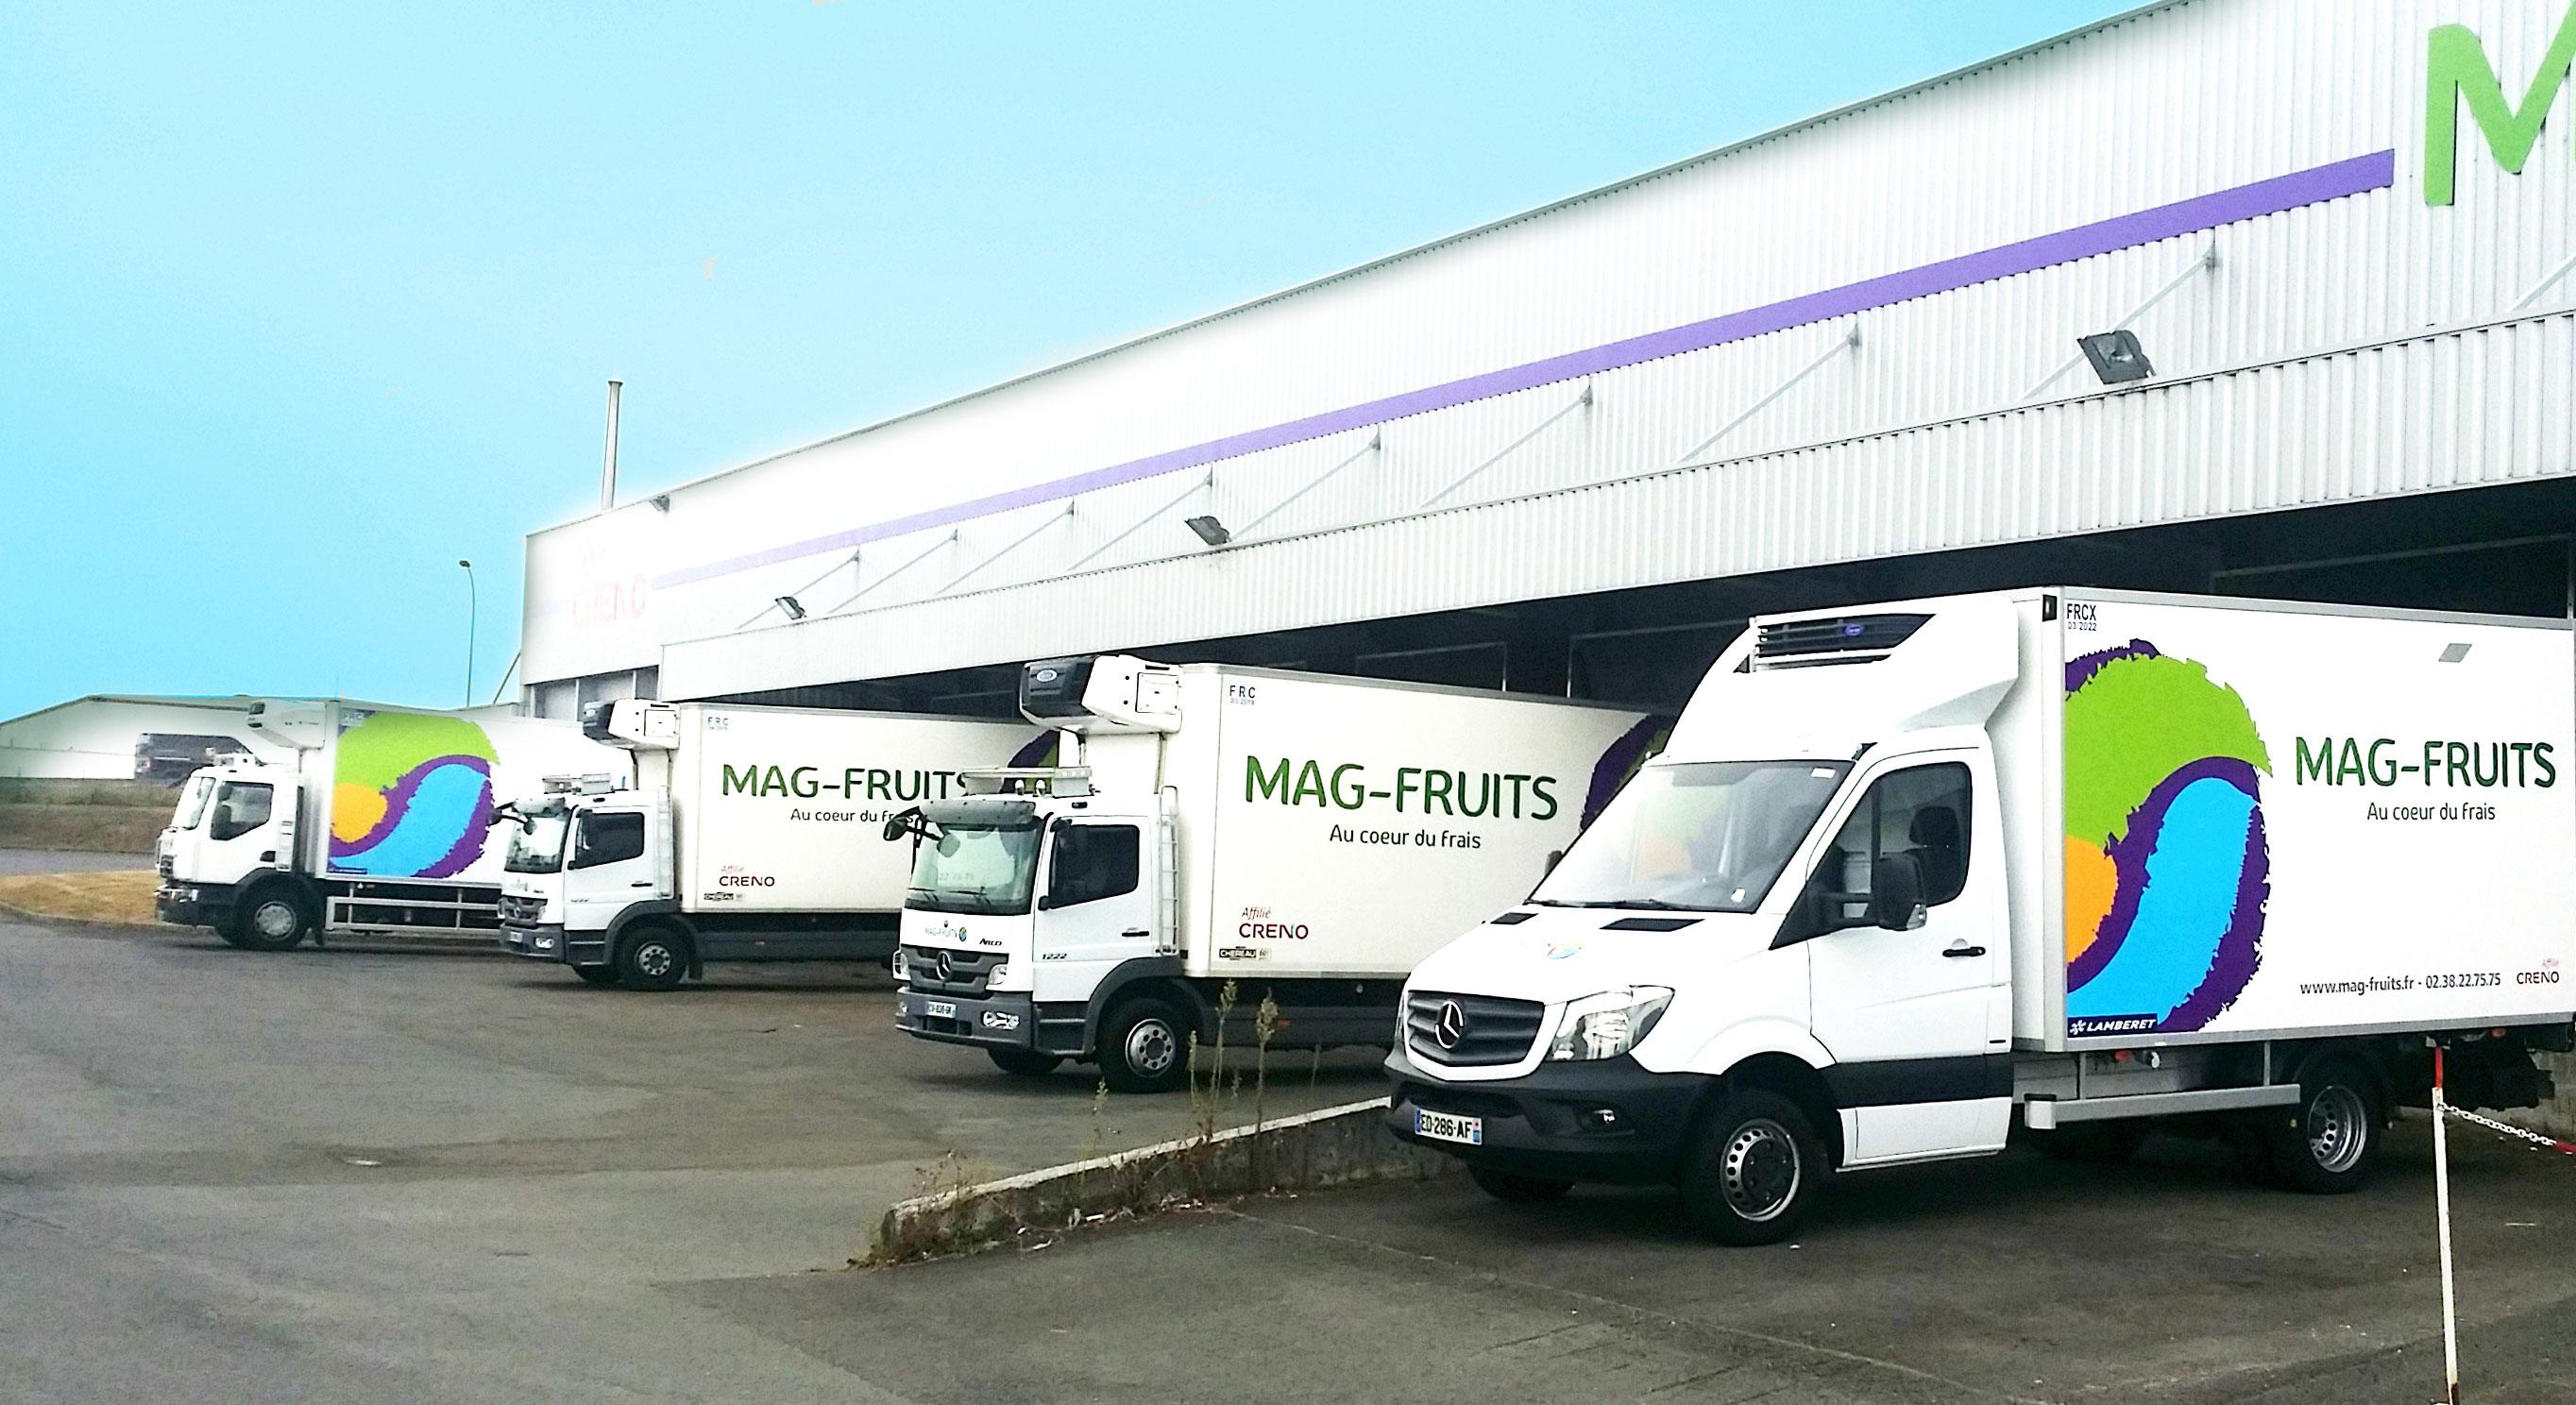 Entrepôt MAG-FRUITS - Ingré